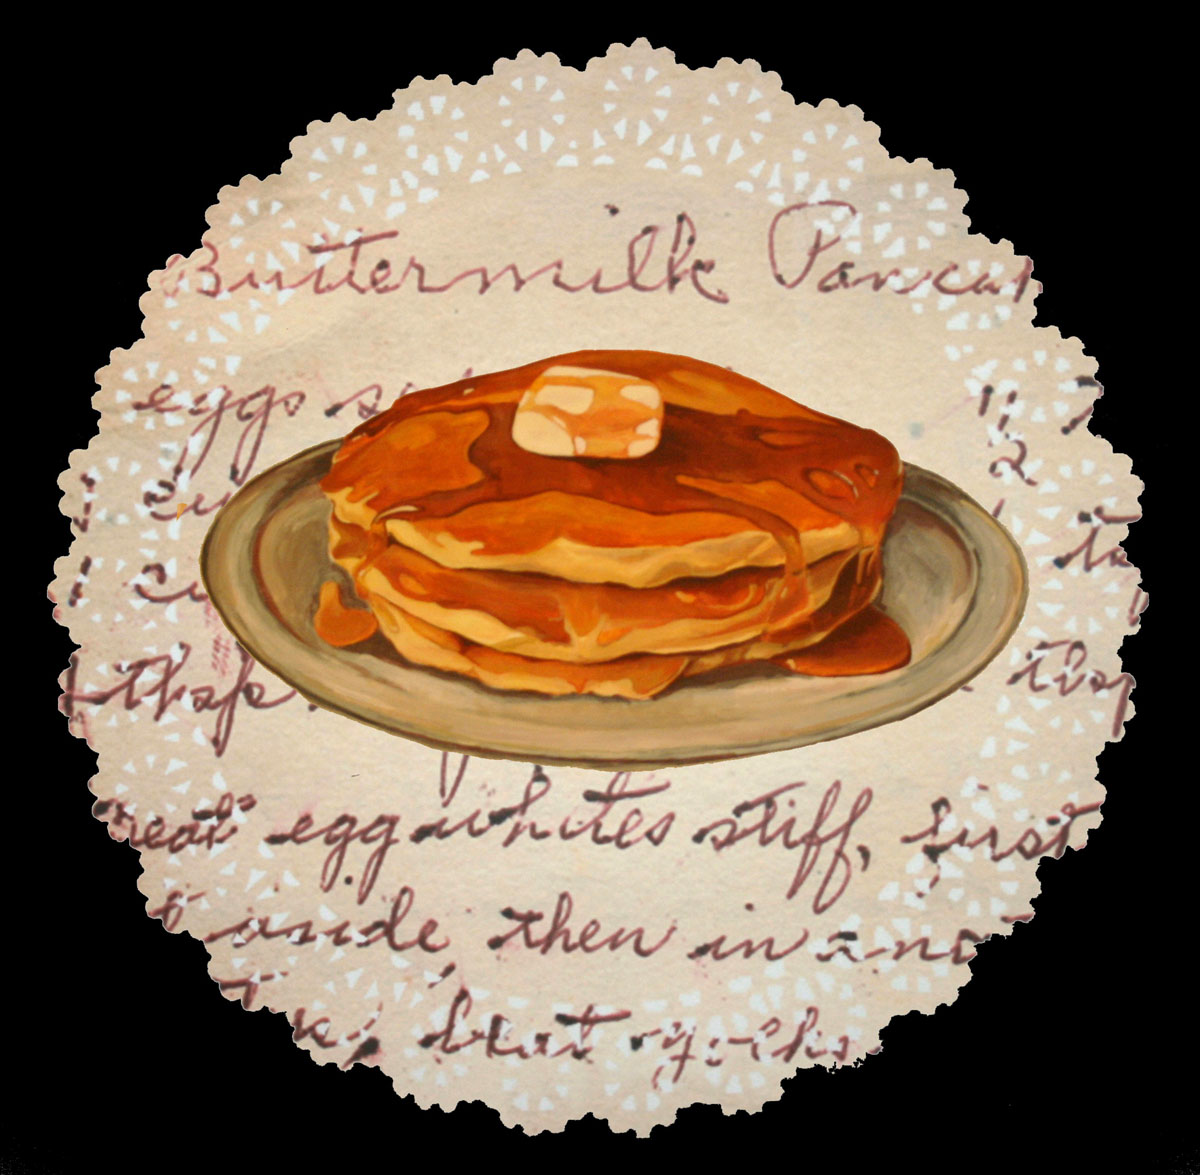 Melissa Harshman Buttermilk Pancakes acrylic on paper, lut jet 19 x 19 inches MHA 005G.jpg